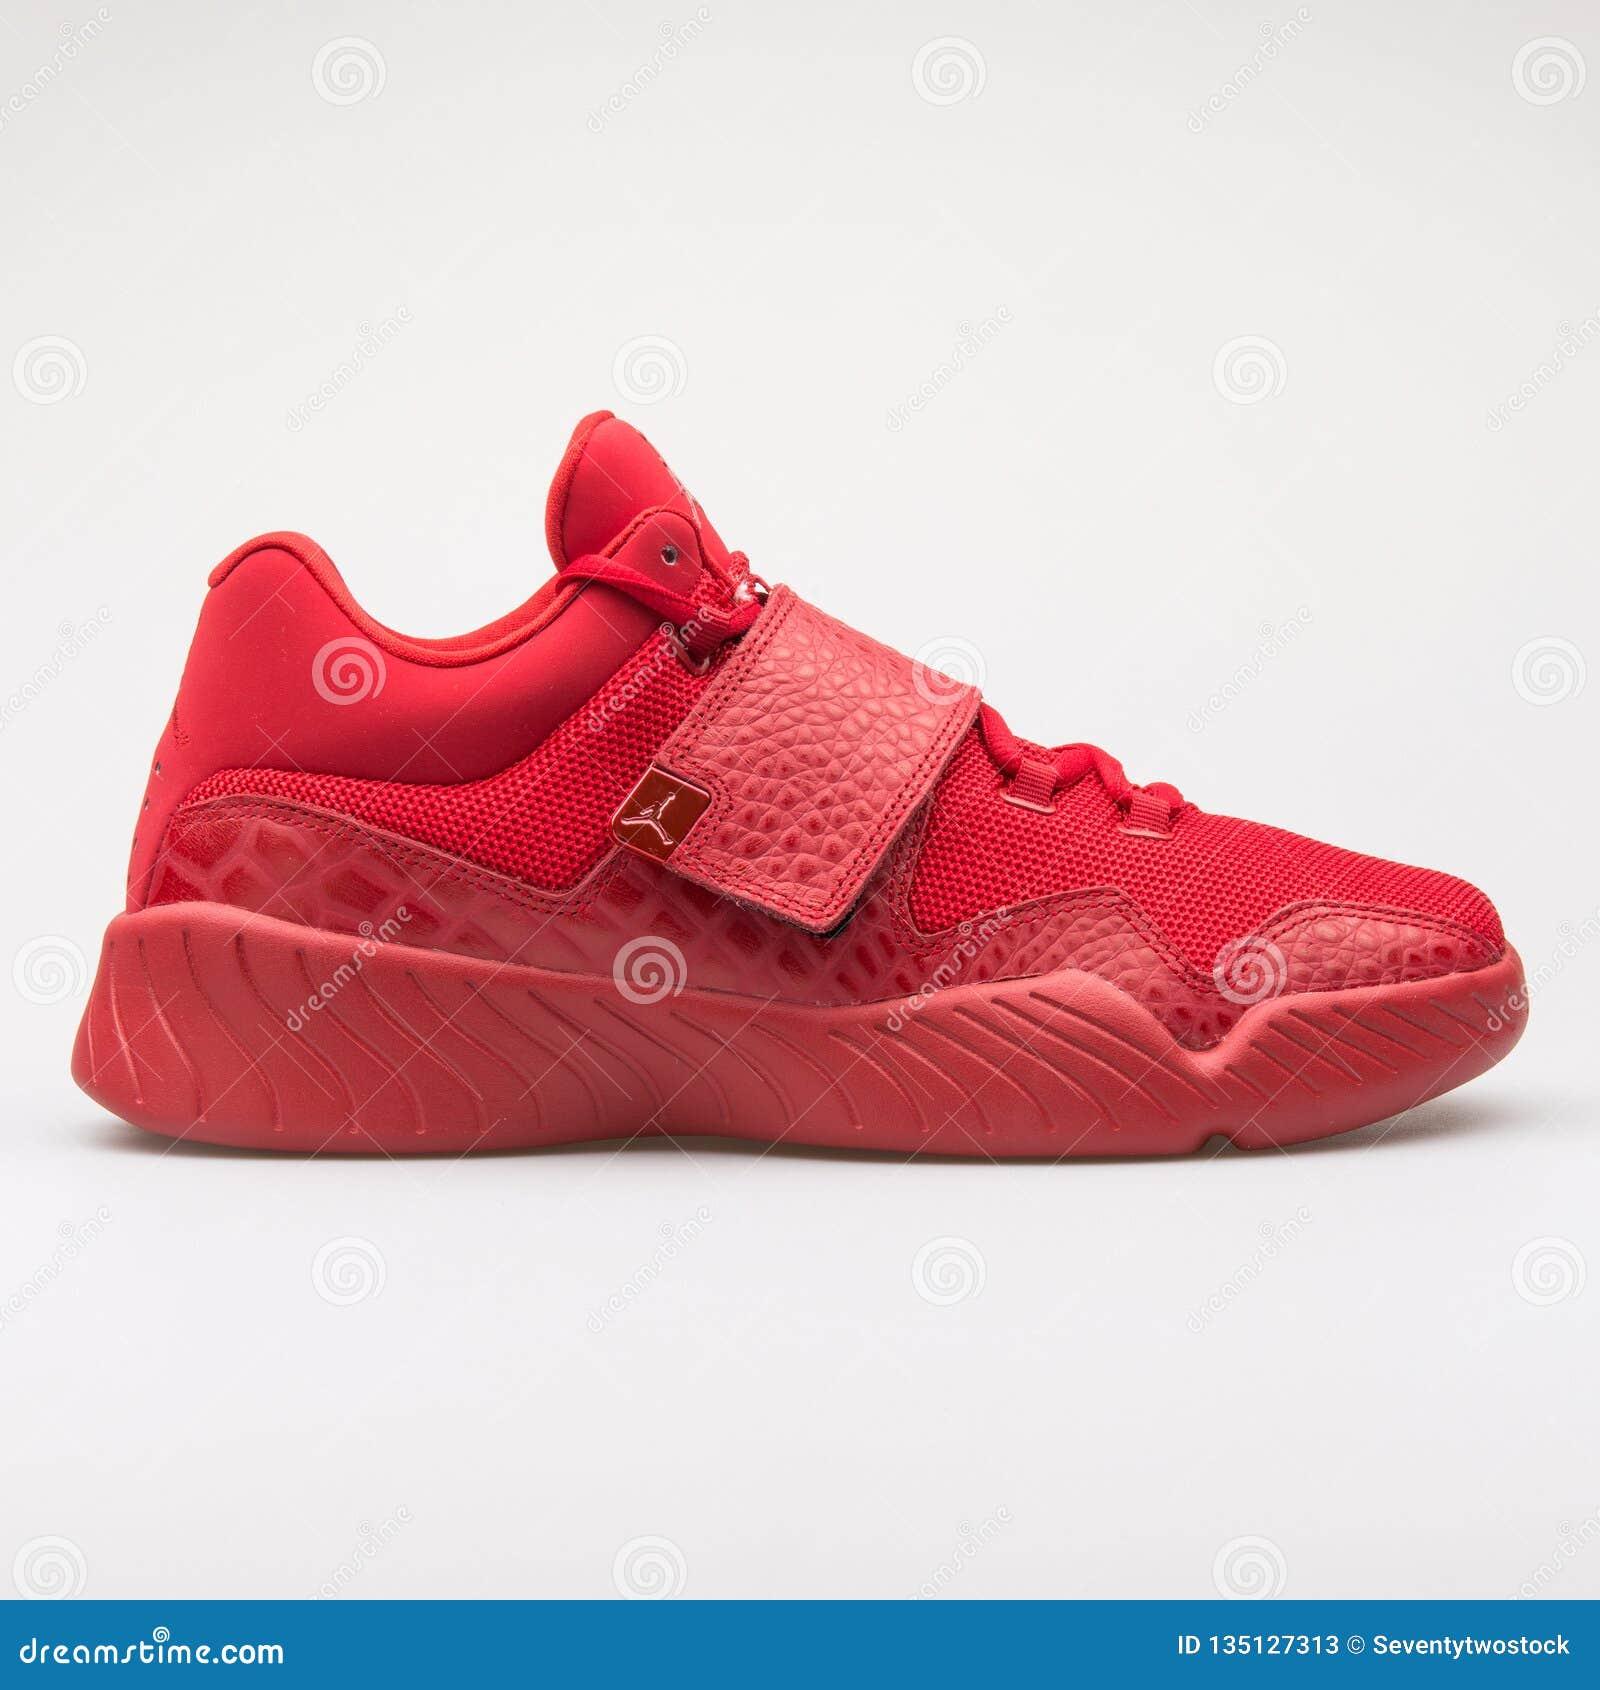 956a9d51db8c5e Nike Jordan J23 Red Sneaker Editorial Stock Photo - Image of ...